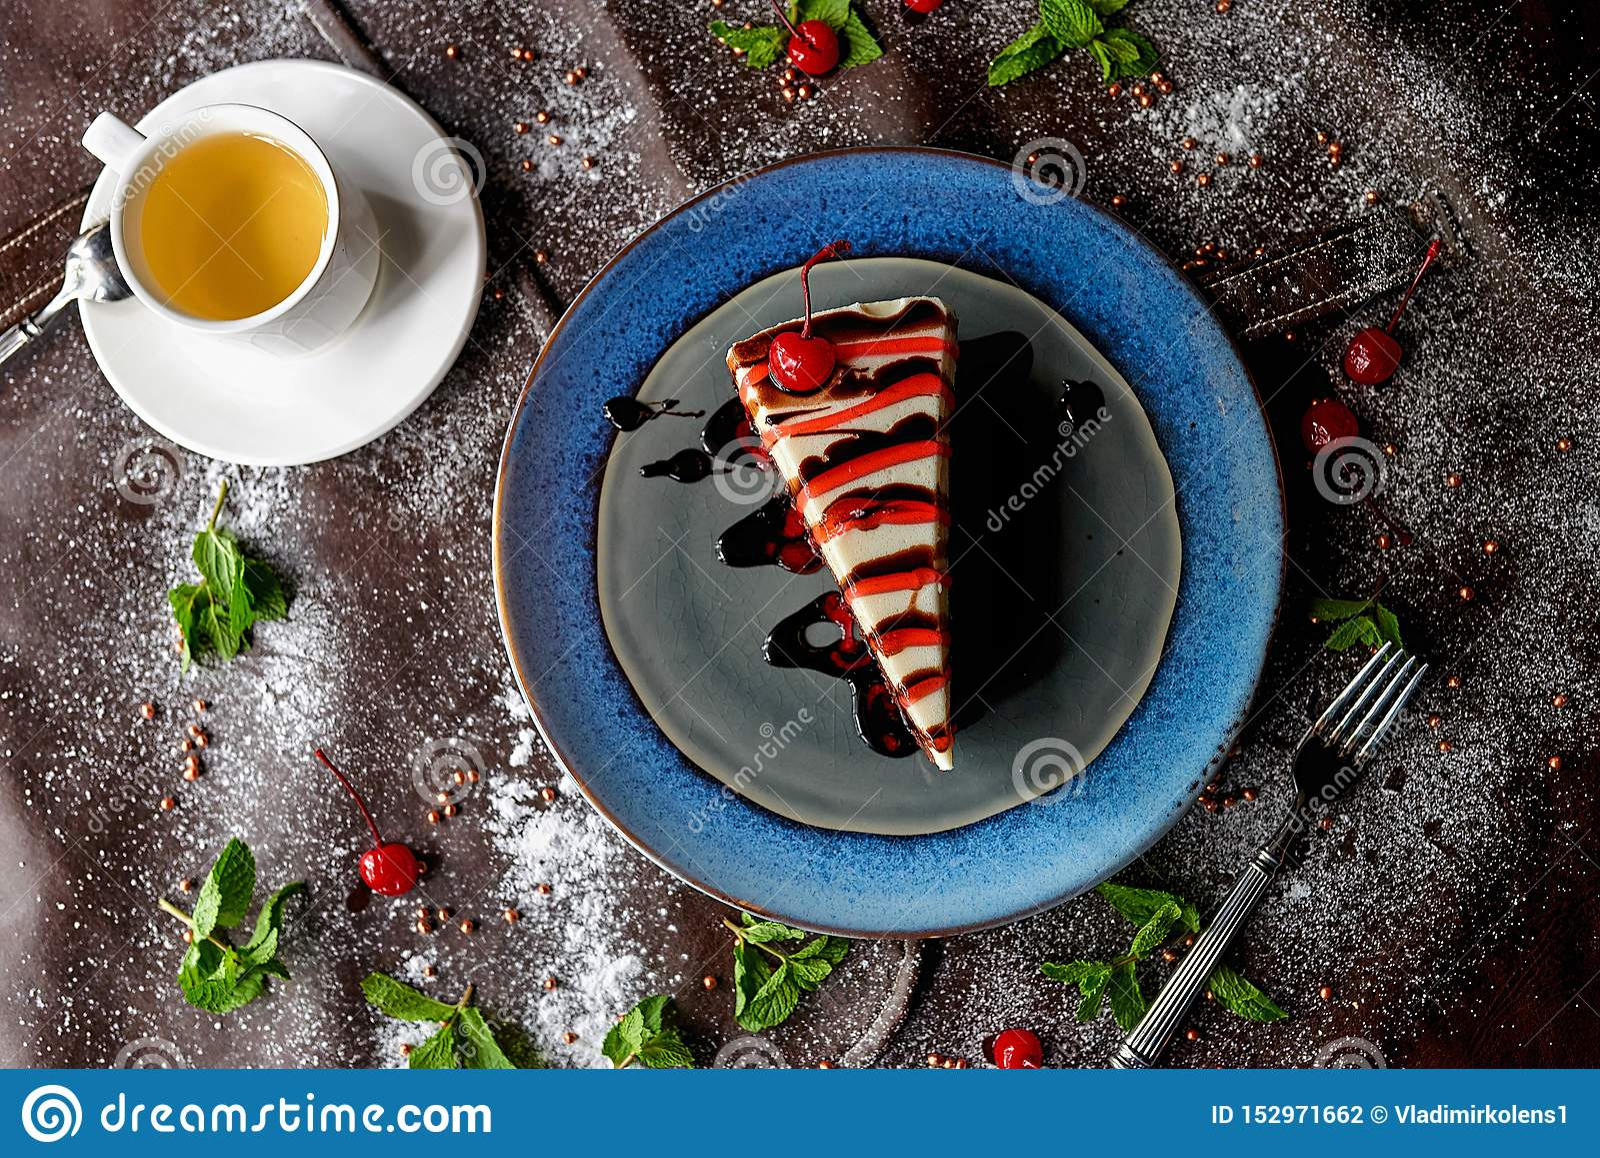 Chocolate cake in powdered sugar